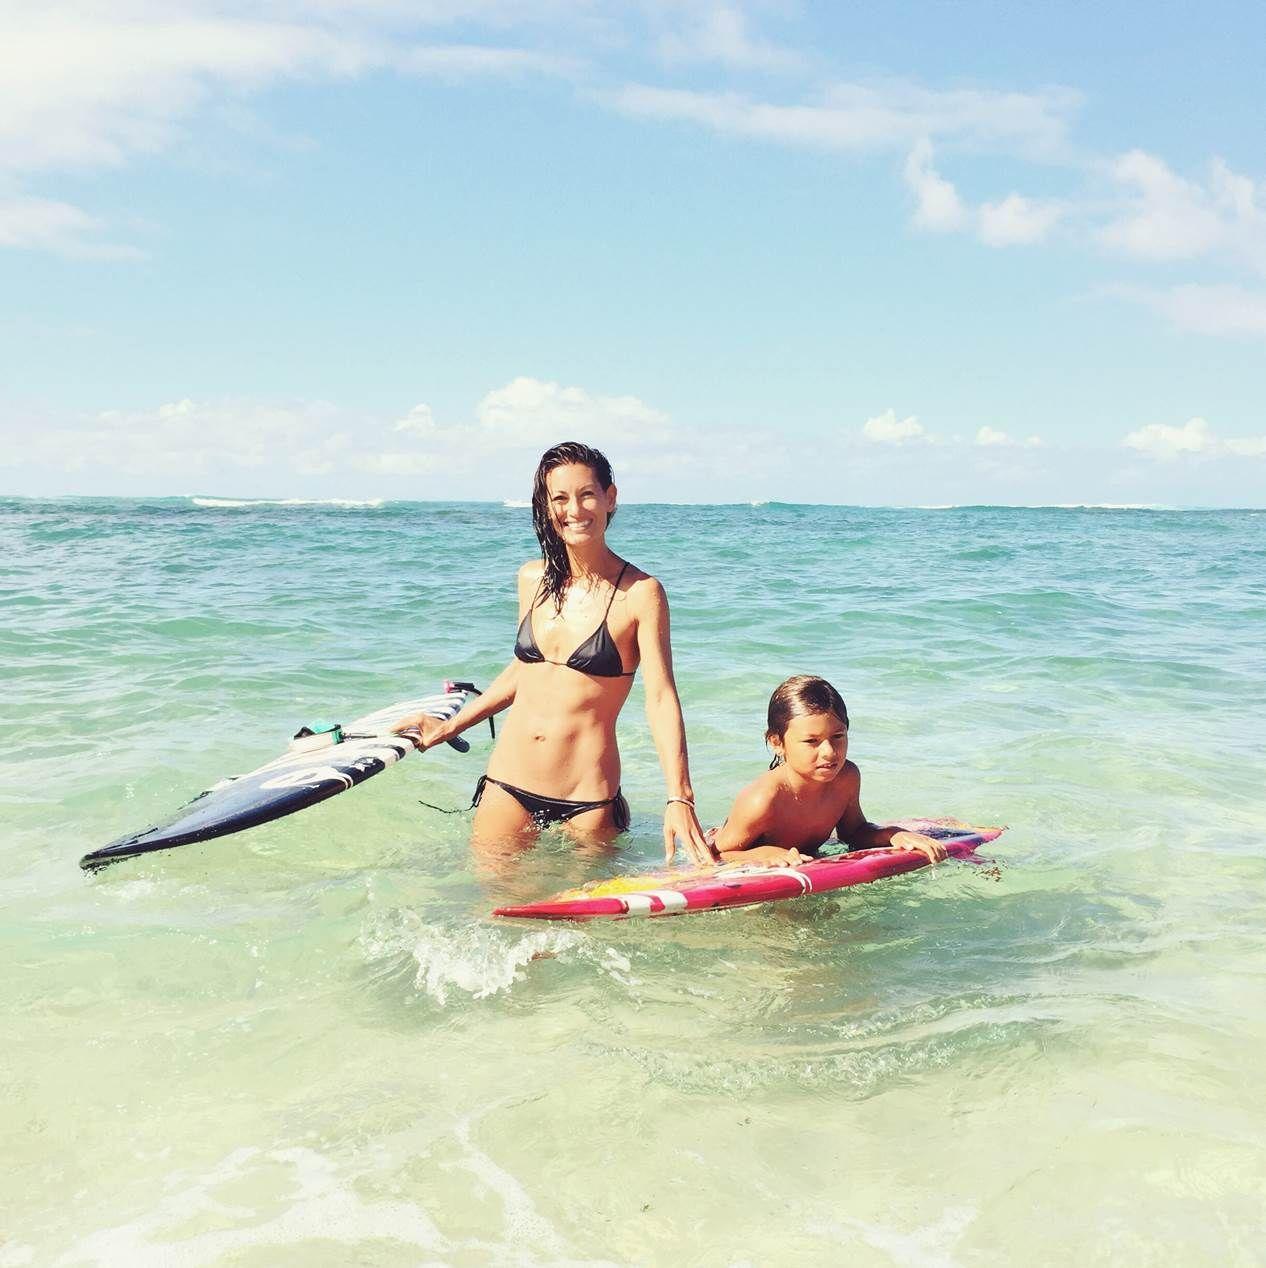 Malia Jones surfing